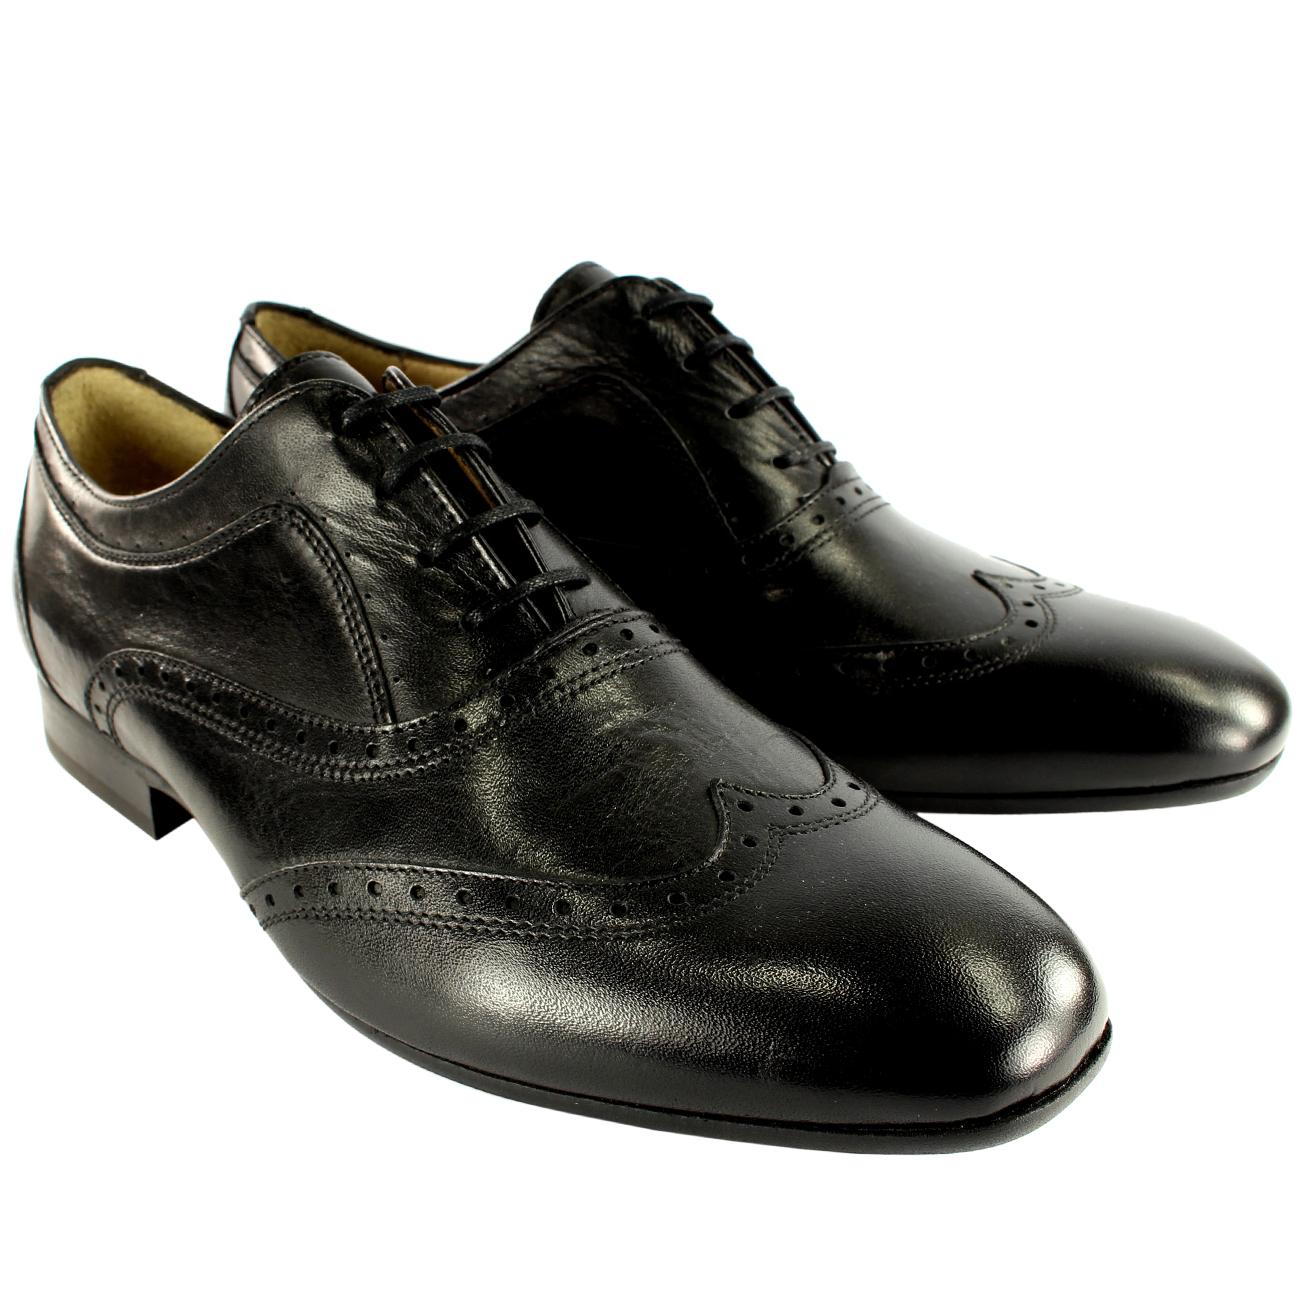 Uomo H By Hudson Francis Brogue Lace Up Up Up Smart Leder Schuhes New UK Größes 7-13 8f1c87